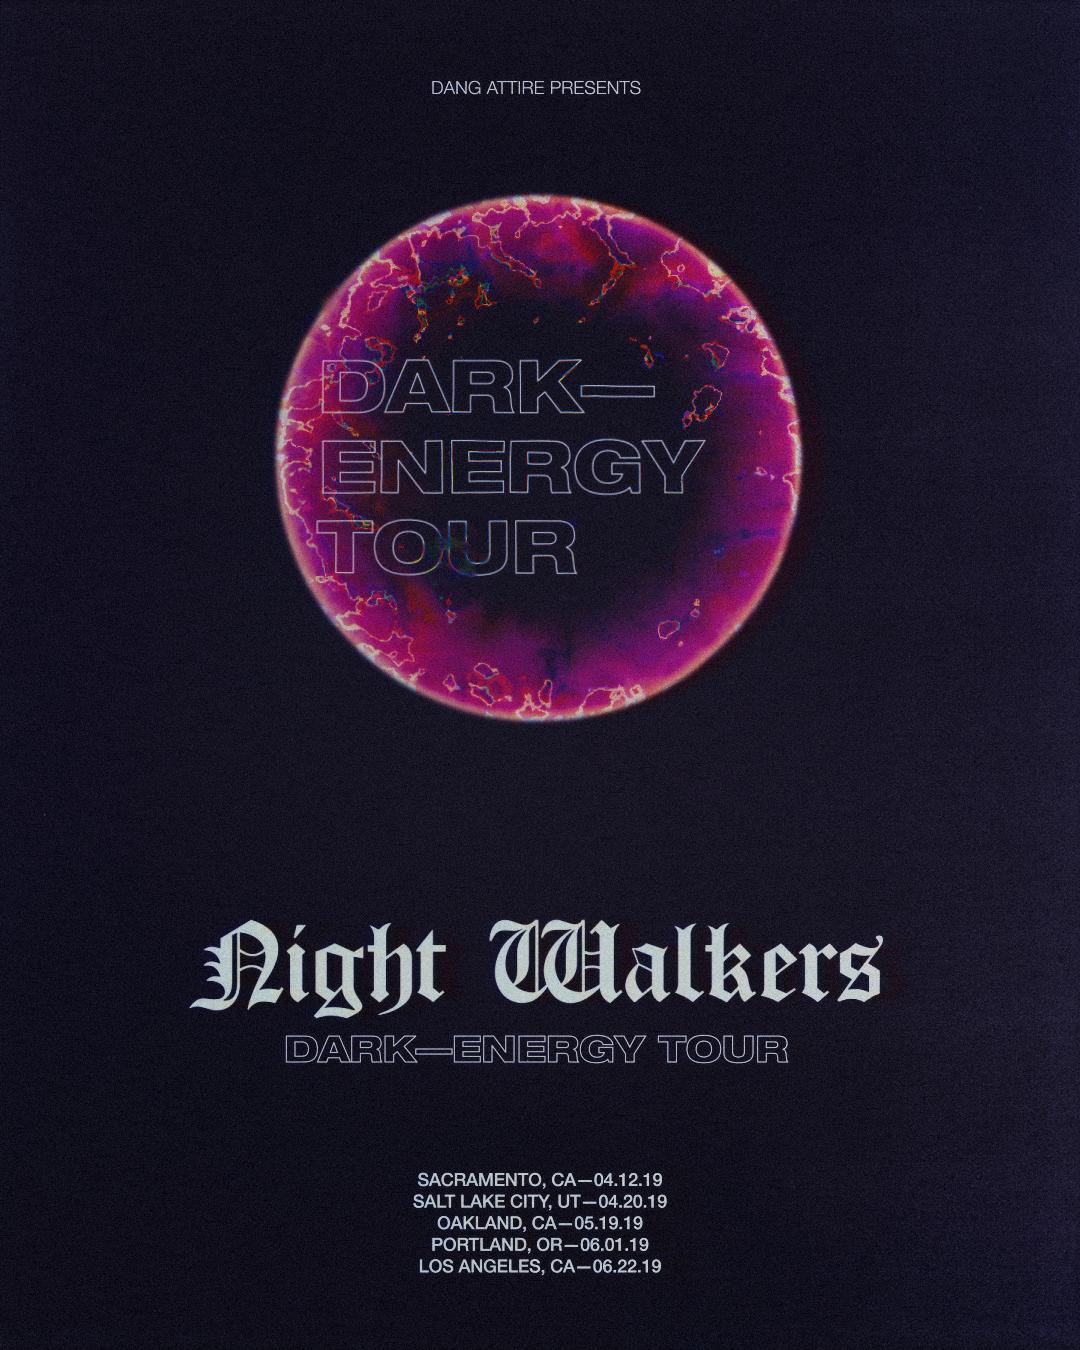 Night Walkers Dark energy Tour 2019 -